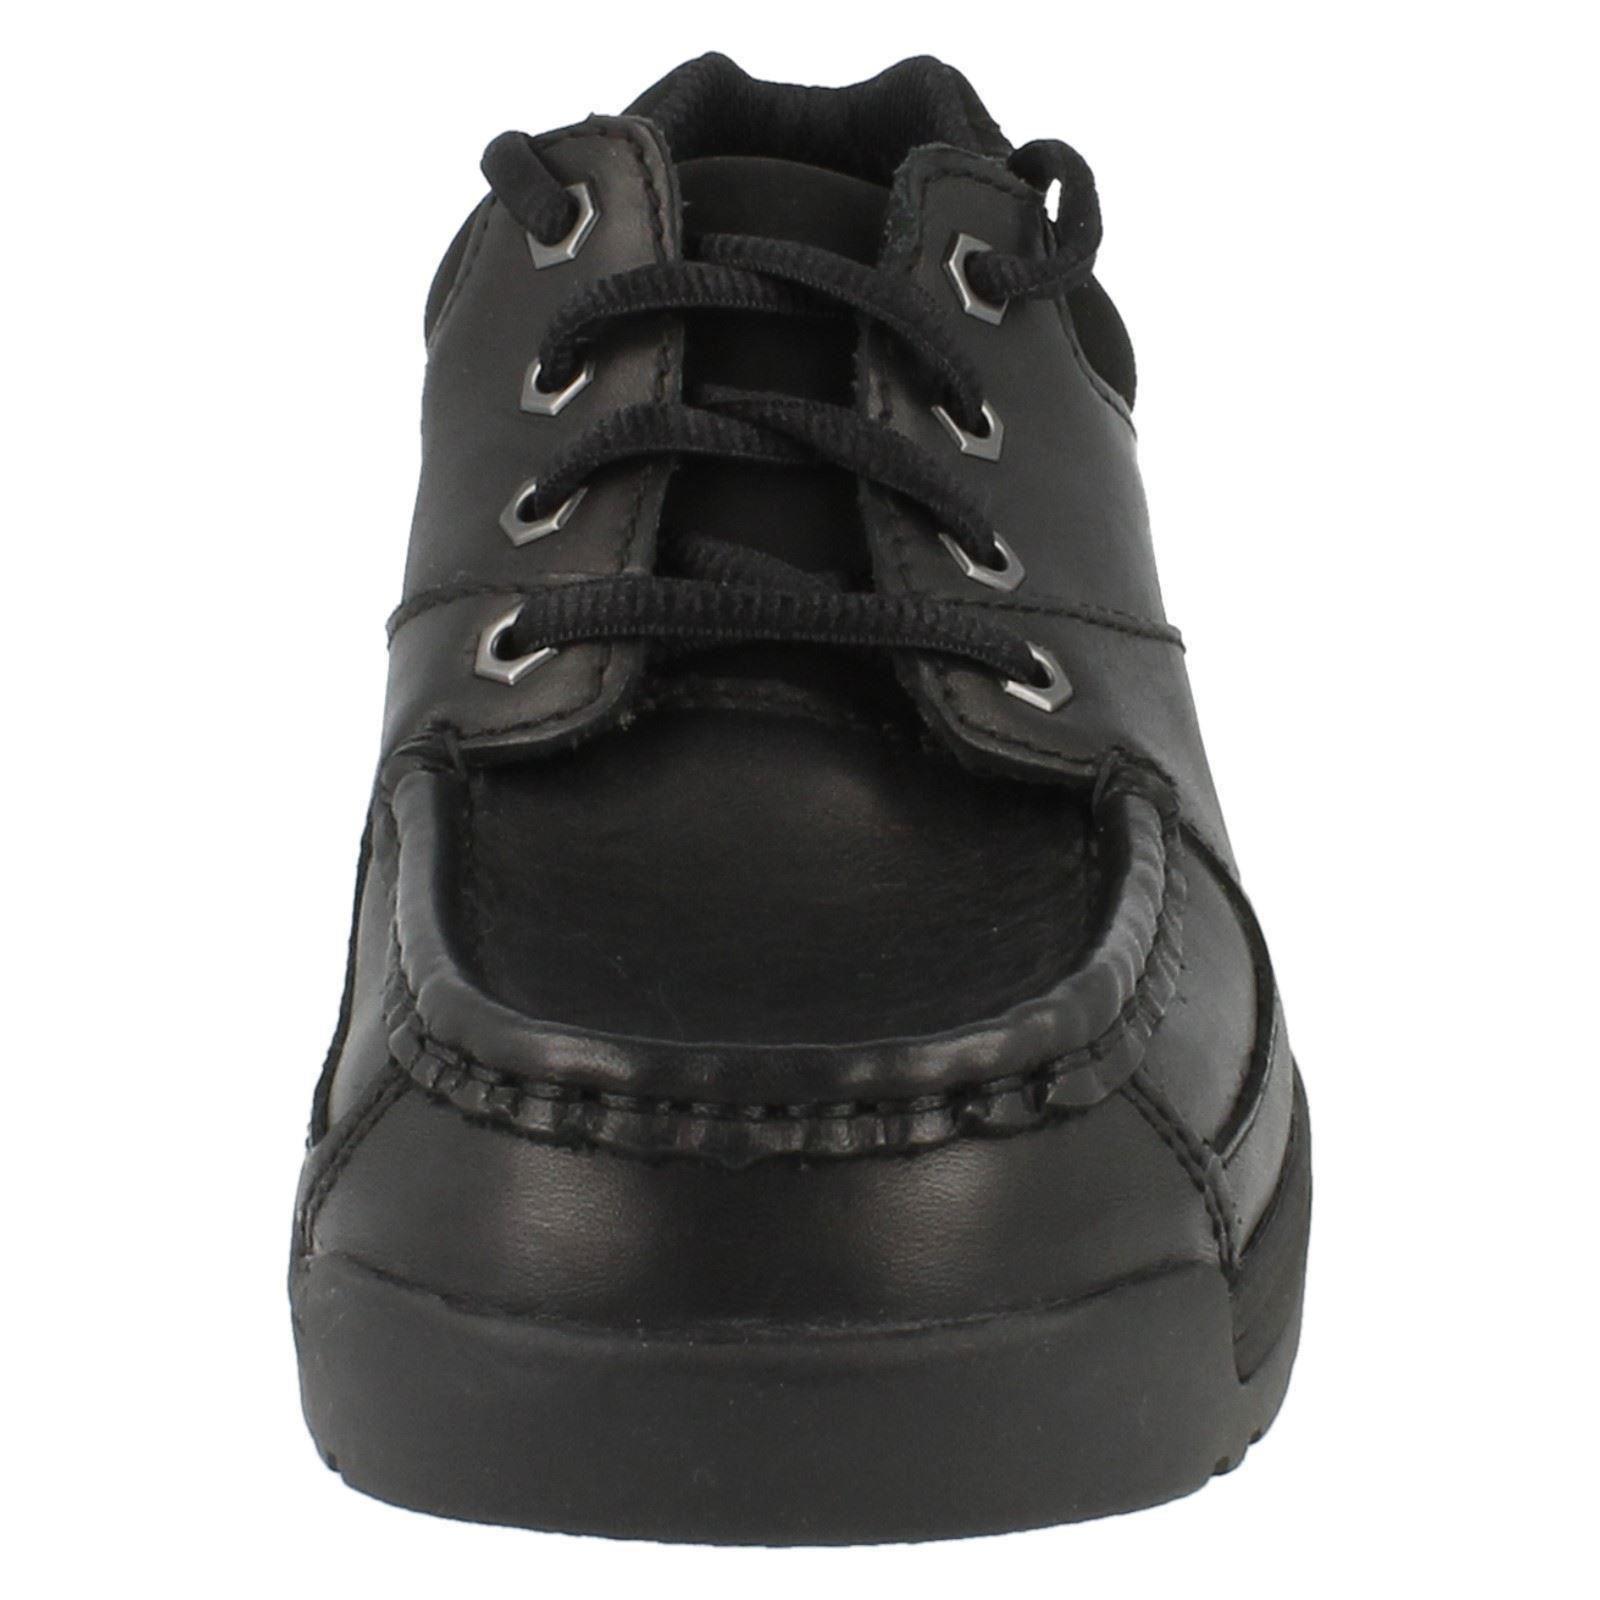 Chicos Clarks Bootleg 'aire Moc' Escuela Zapatos Estilo ~ K